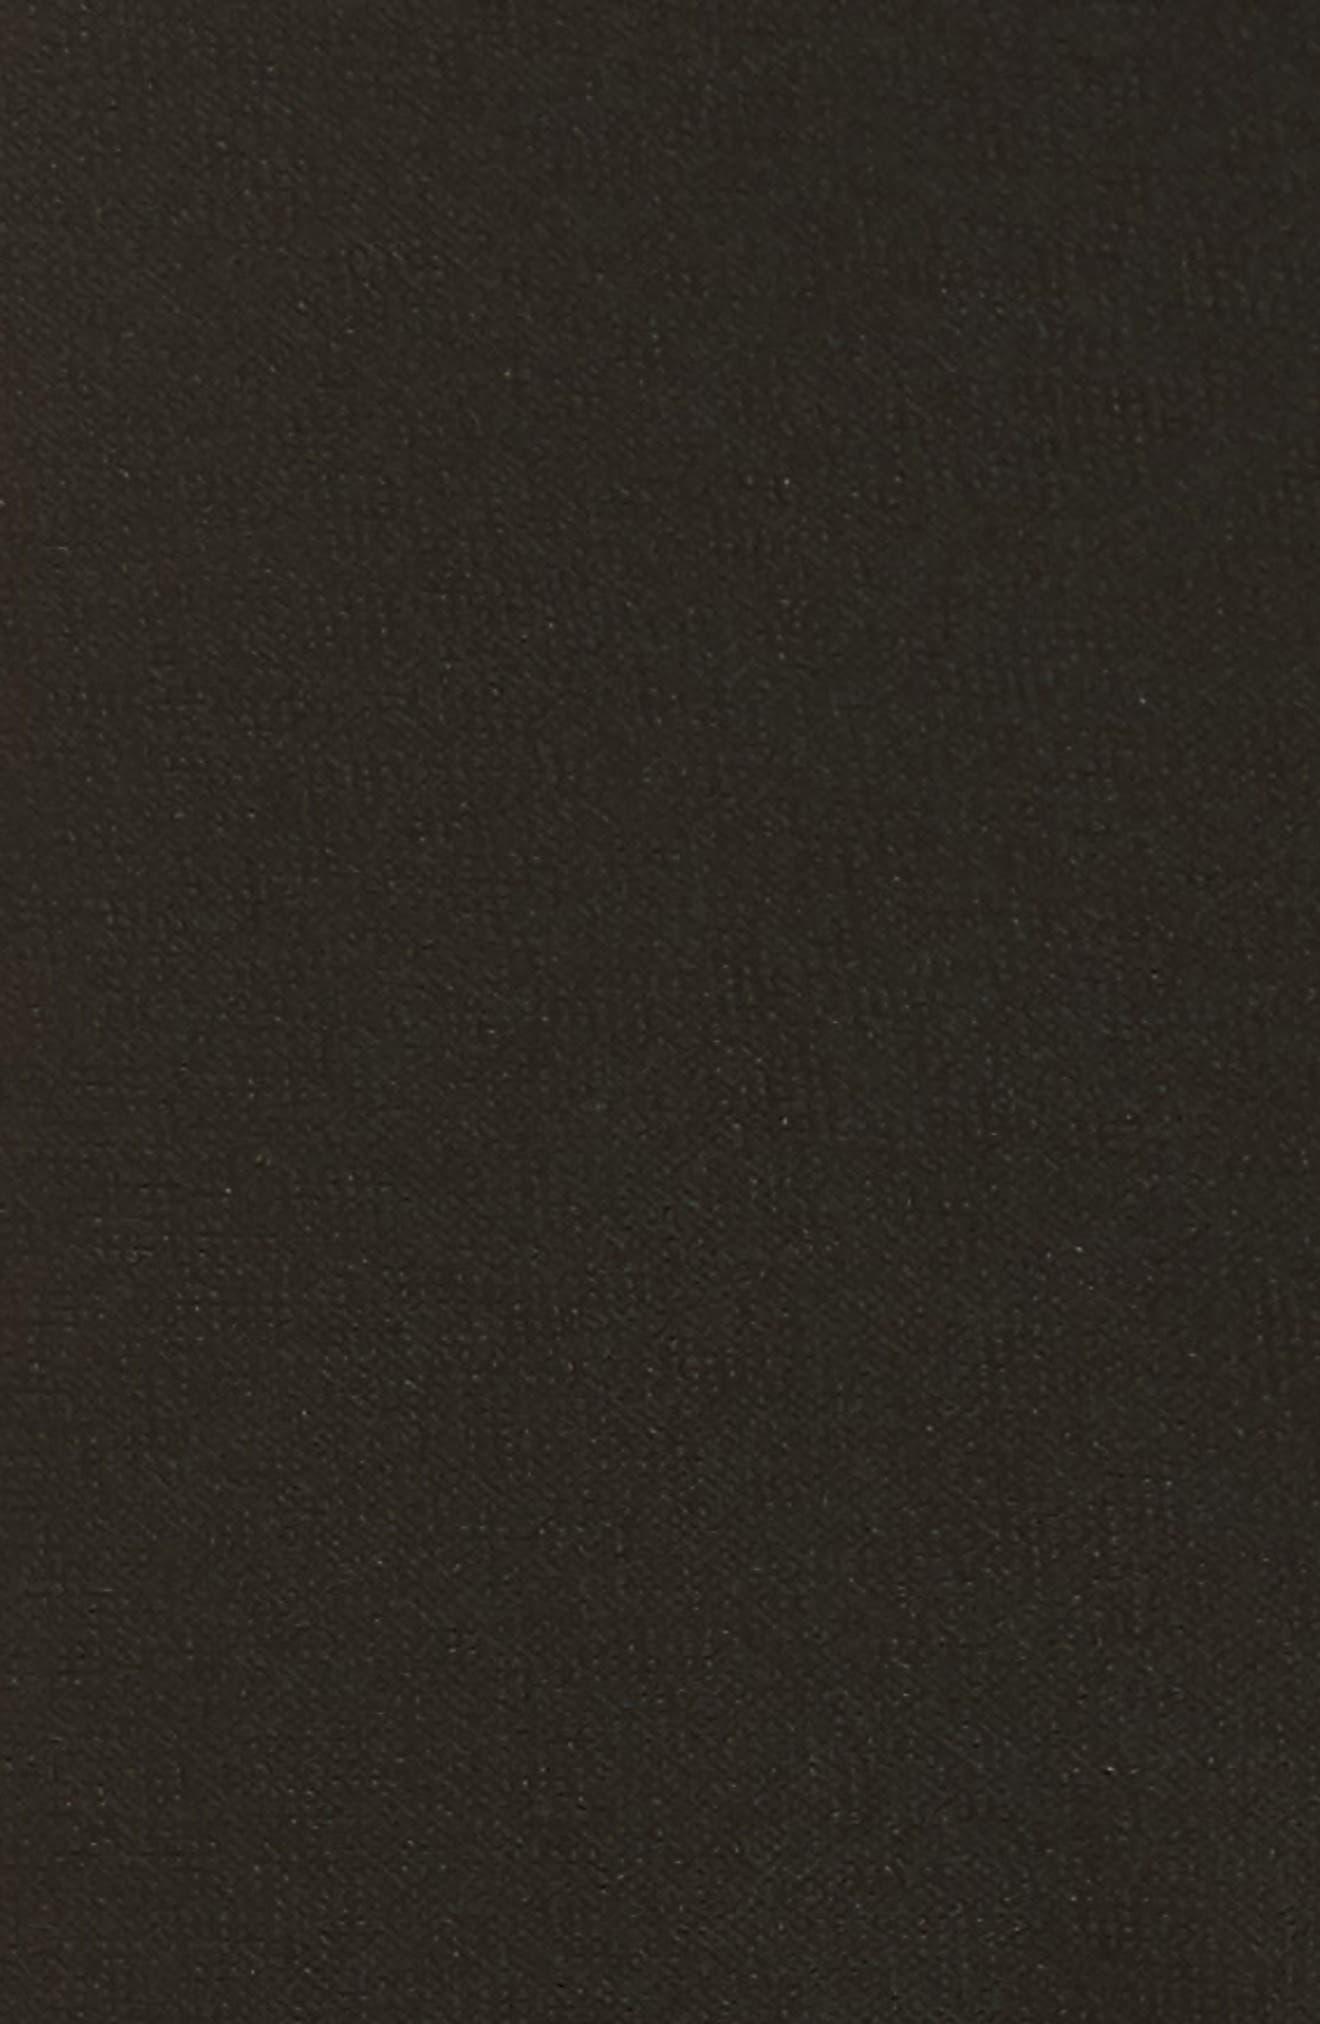 Stretch Crepe Slim Ankle Pants,                             Alternate thumbnail 7, color,                             Black